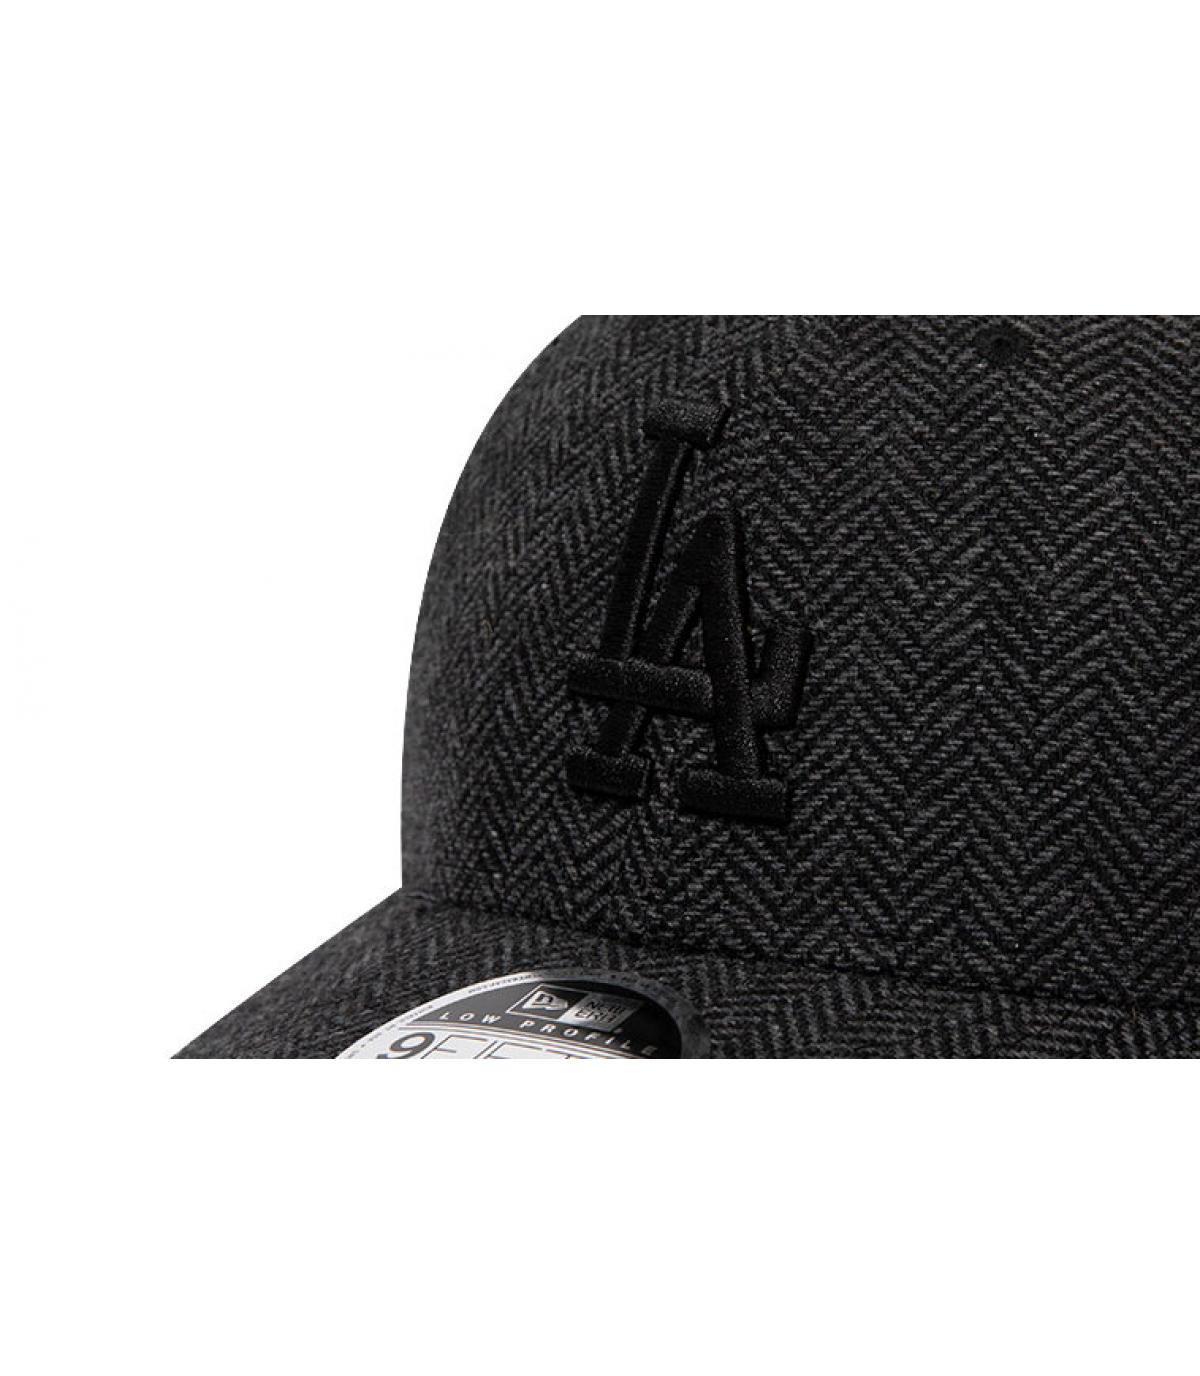 Details MLB Tweed LA 950 black - afbeeling 3